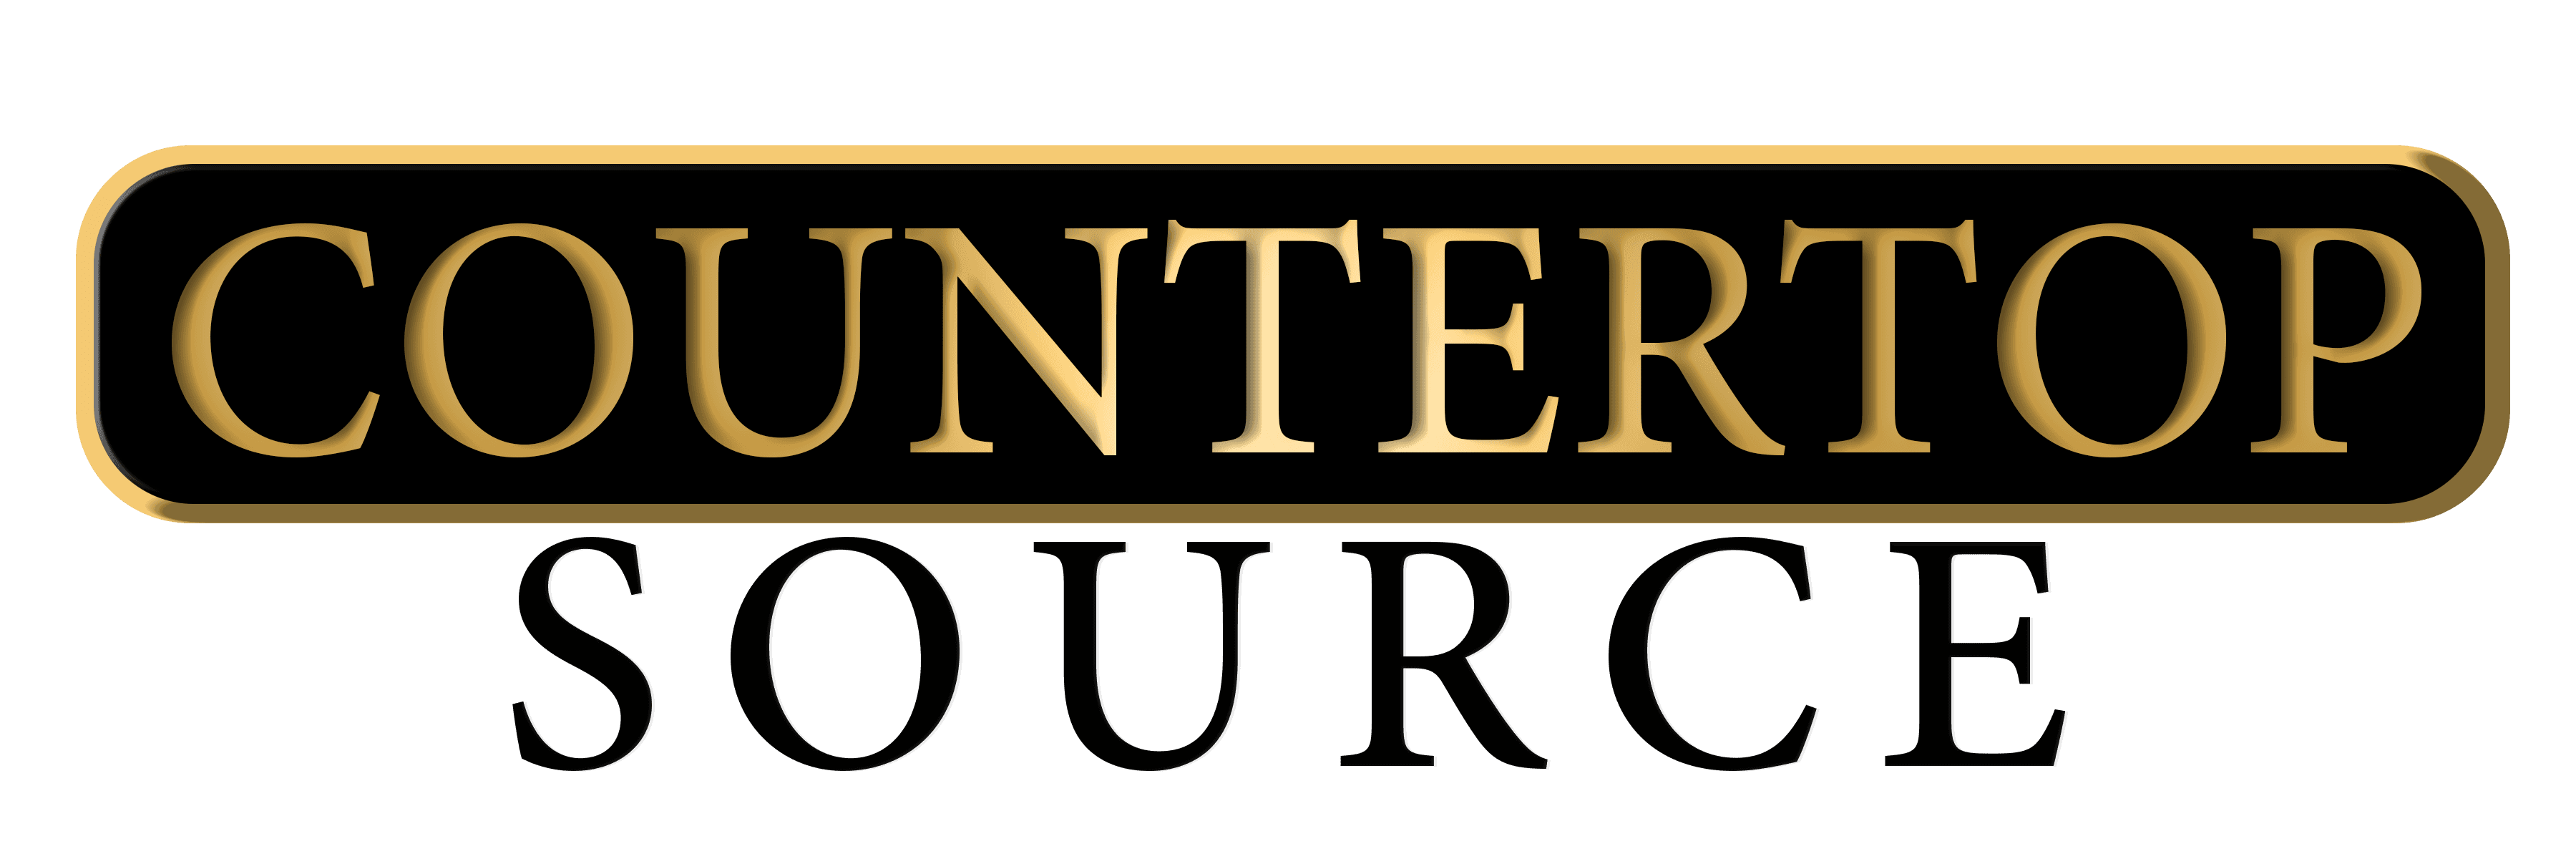 Cambria - Countertop Source